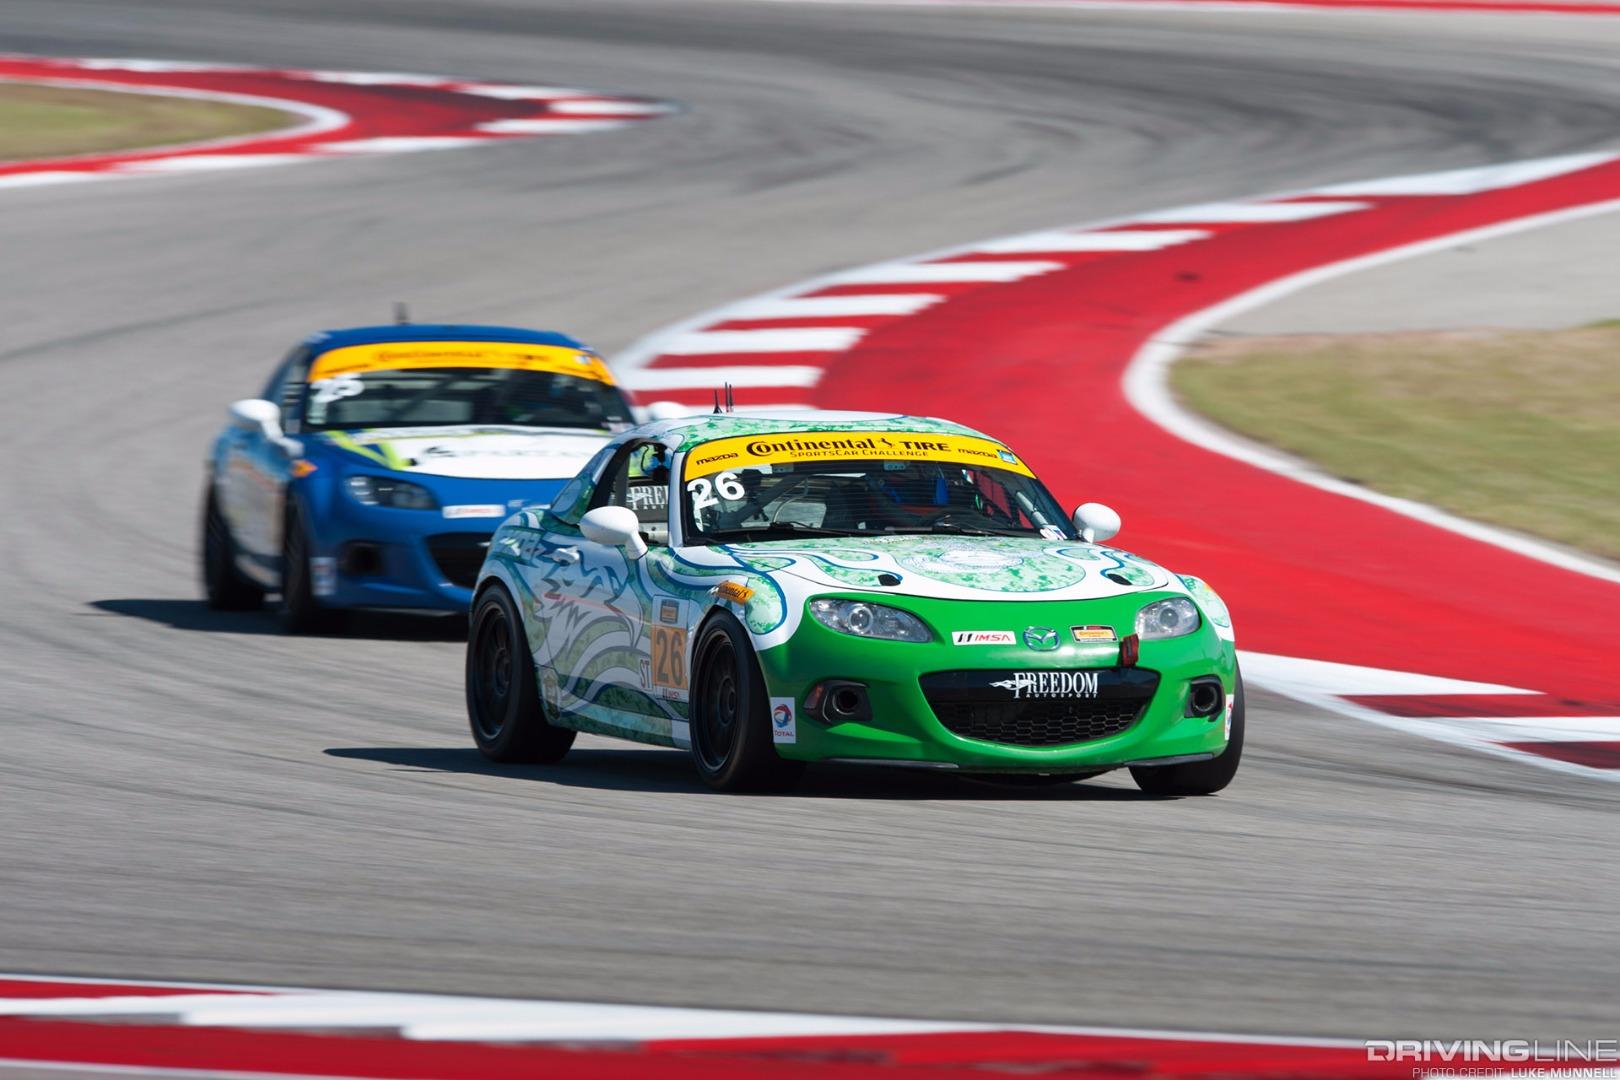 IMSA COTA 2017: Why Sportscar Racing Rocks | DrivingLine